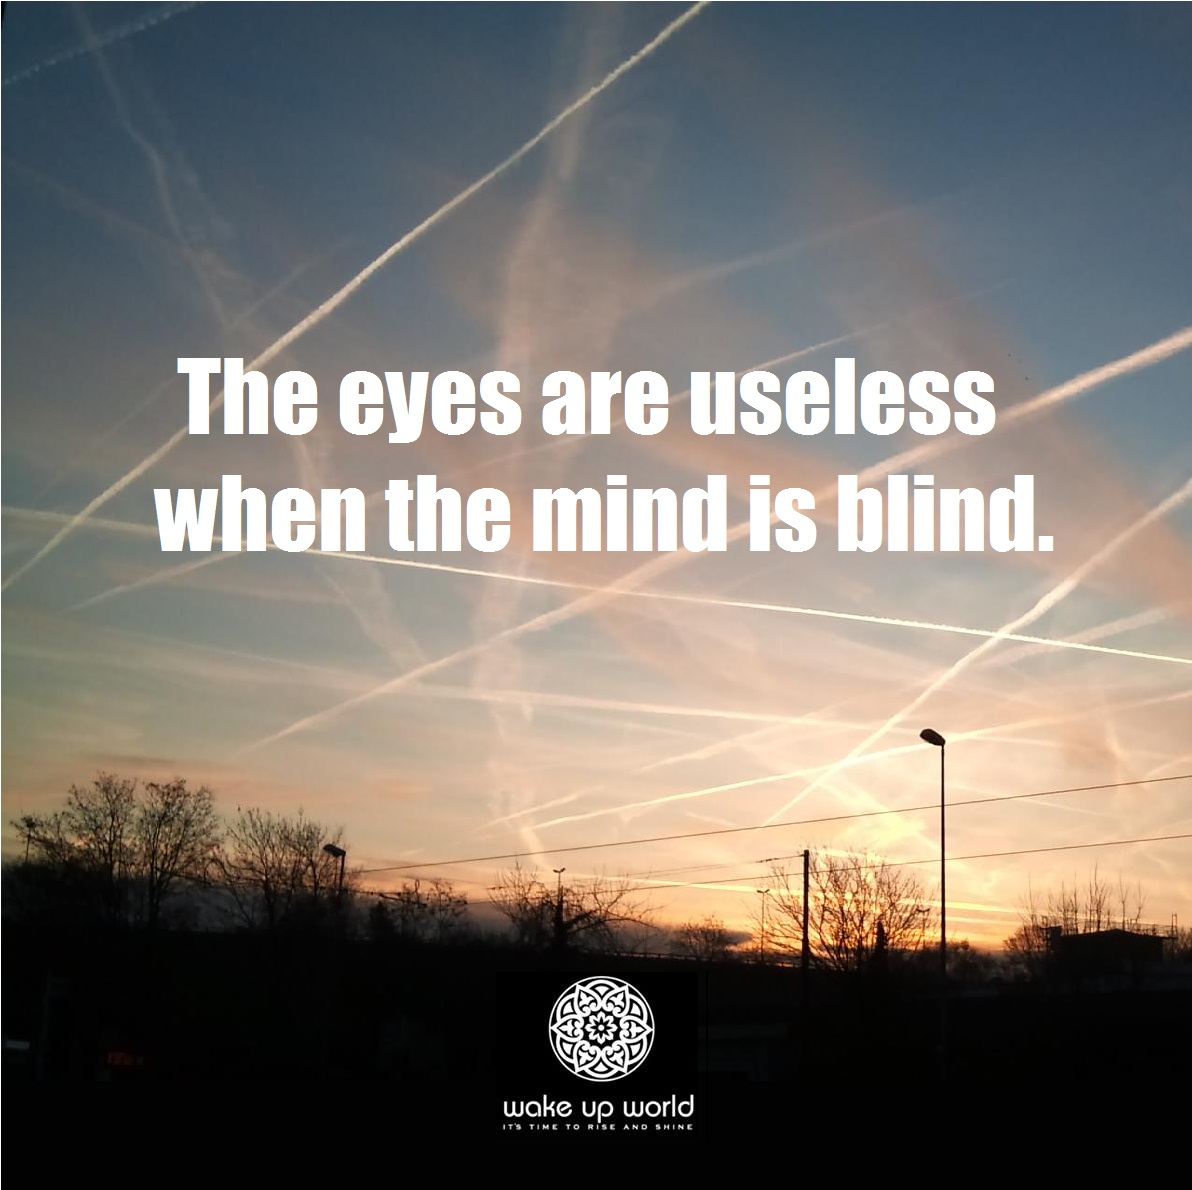 Geoengineering-The-Eyes-Are-Useless-When-The-Mind-Is-Blind-Meme